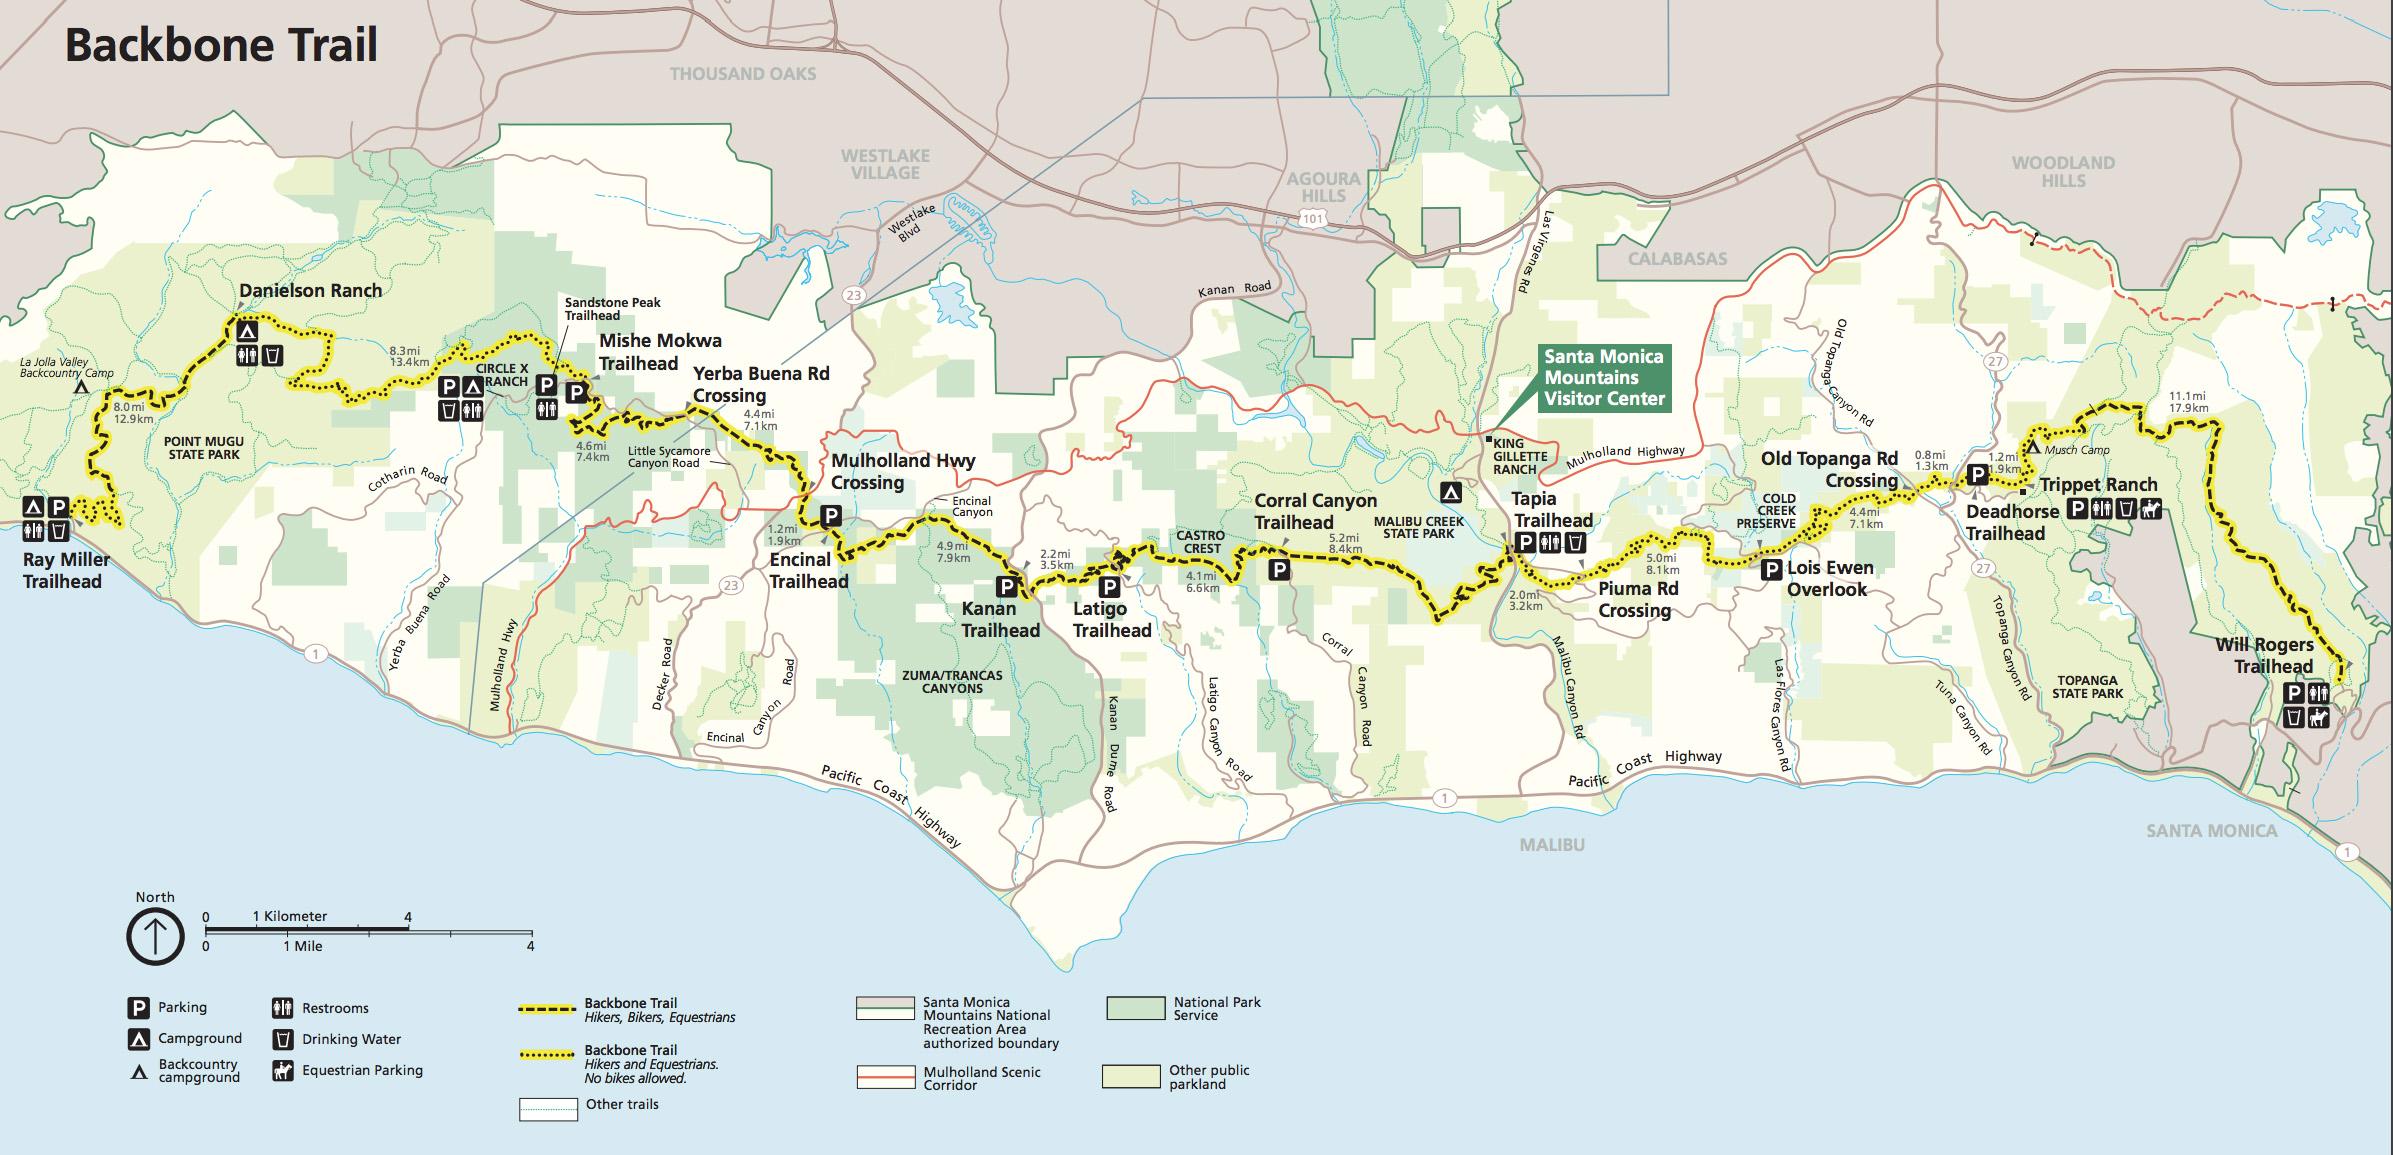 backbone-trail-trailnamebackstroke-map.jpg